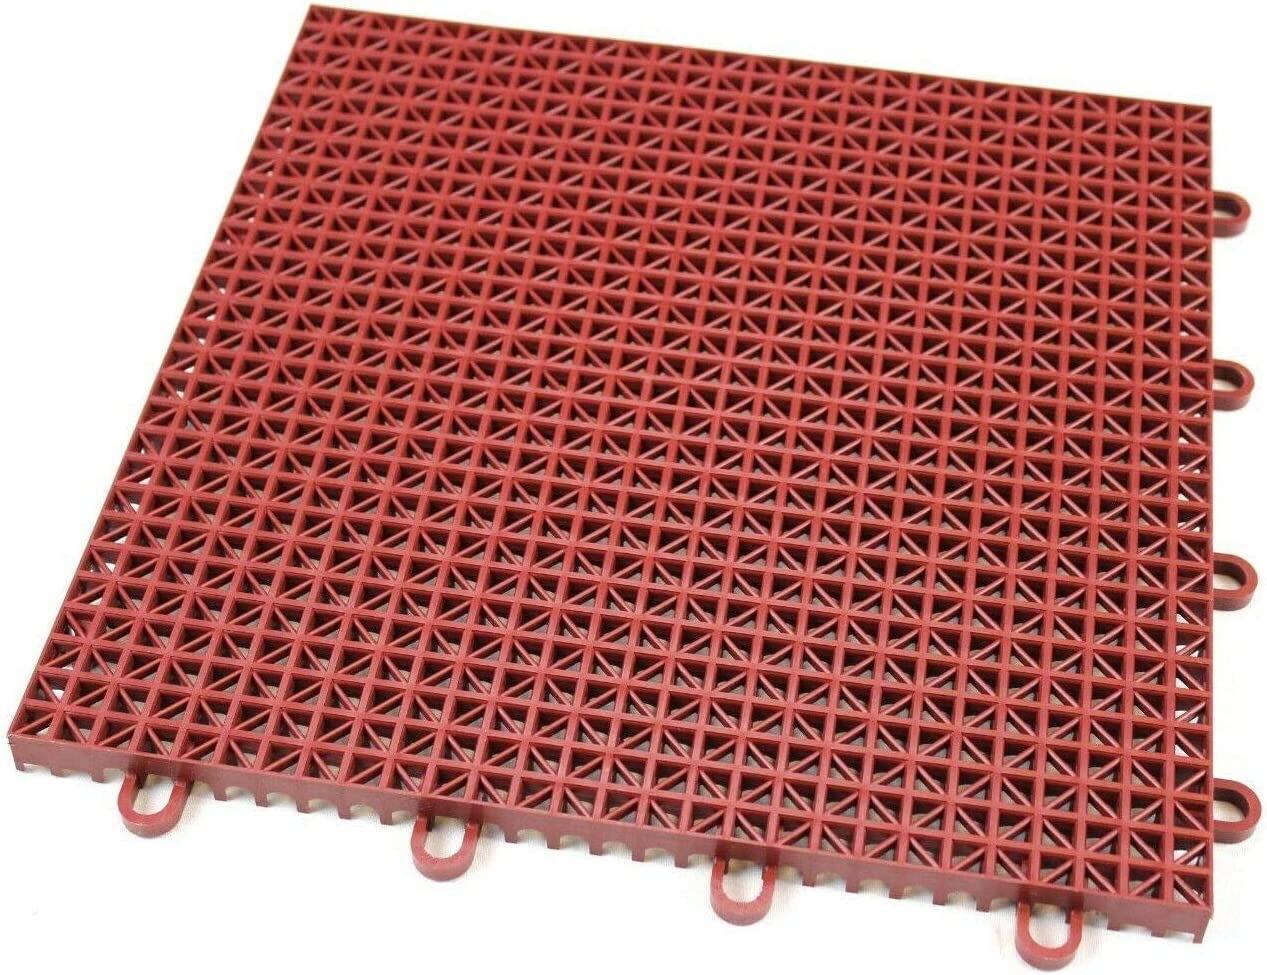 Amazon Com 16 Pack Outdoor Patio Flooring Interlocking Rugged